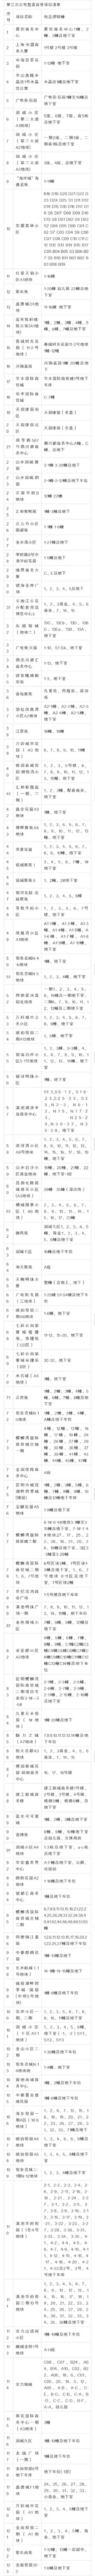 http://www.kmshsm.com/tiyuhuodong/43666.html